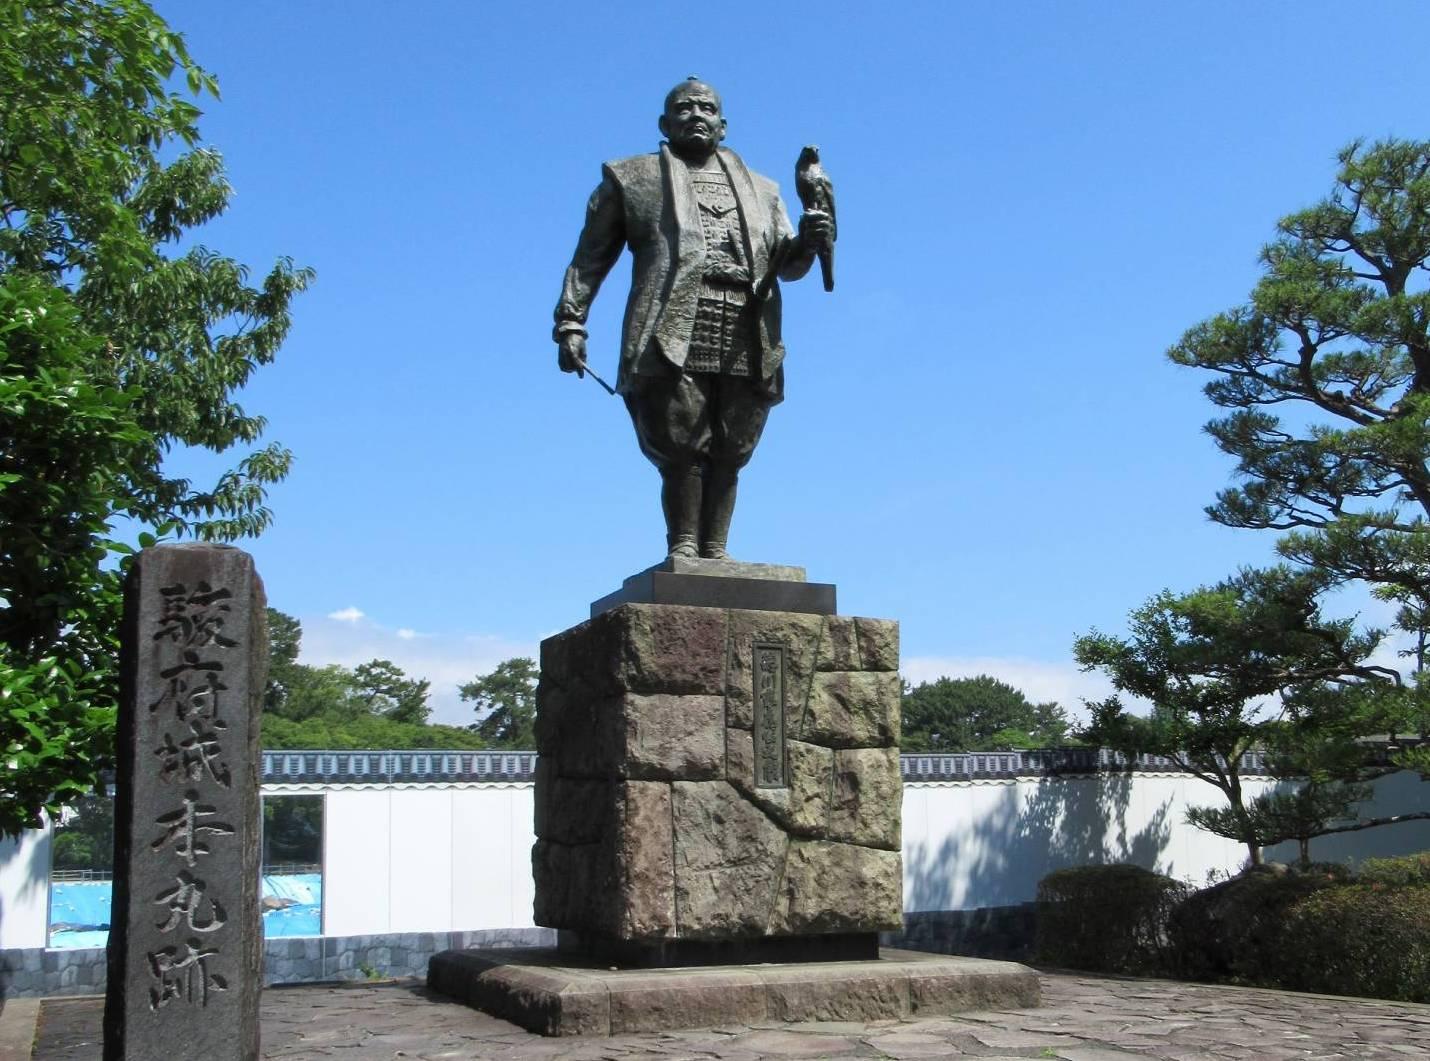 Statue Tokugawa Ieyasus in Shizuoka